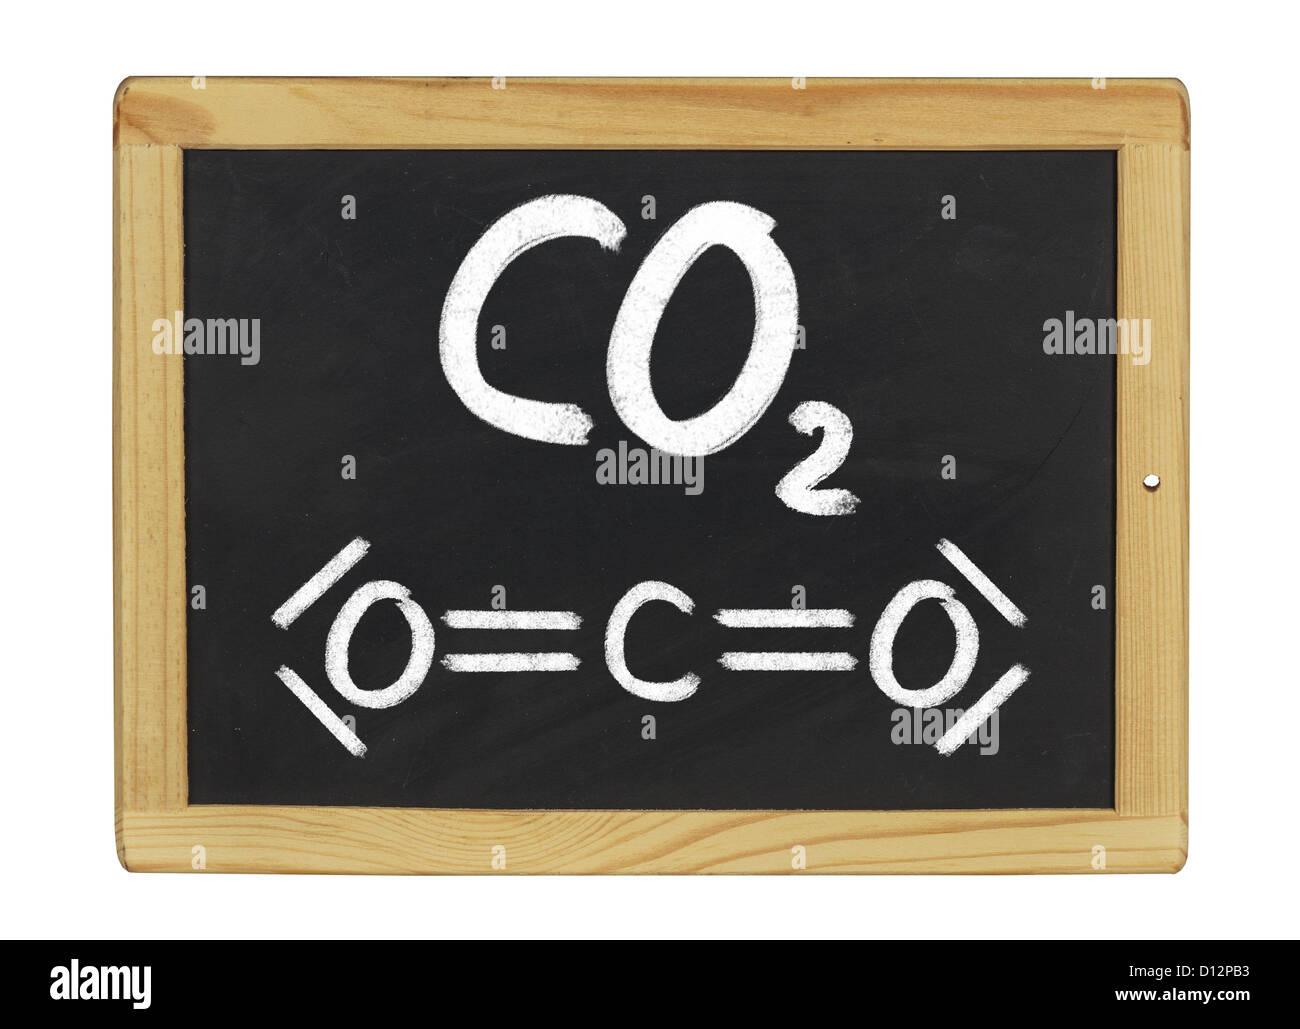 Fórmula química del dióxido de carbono en una pizarra Imagen De Stock